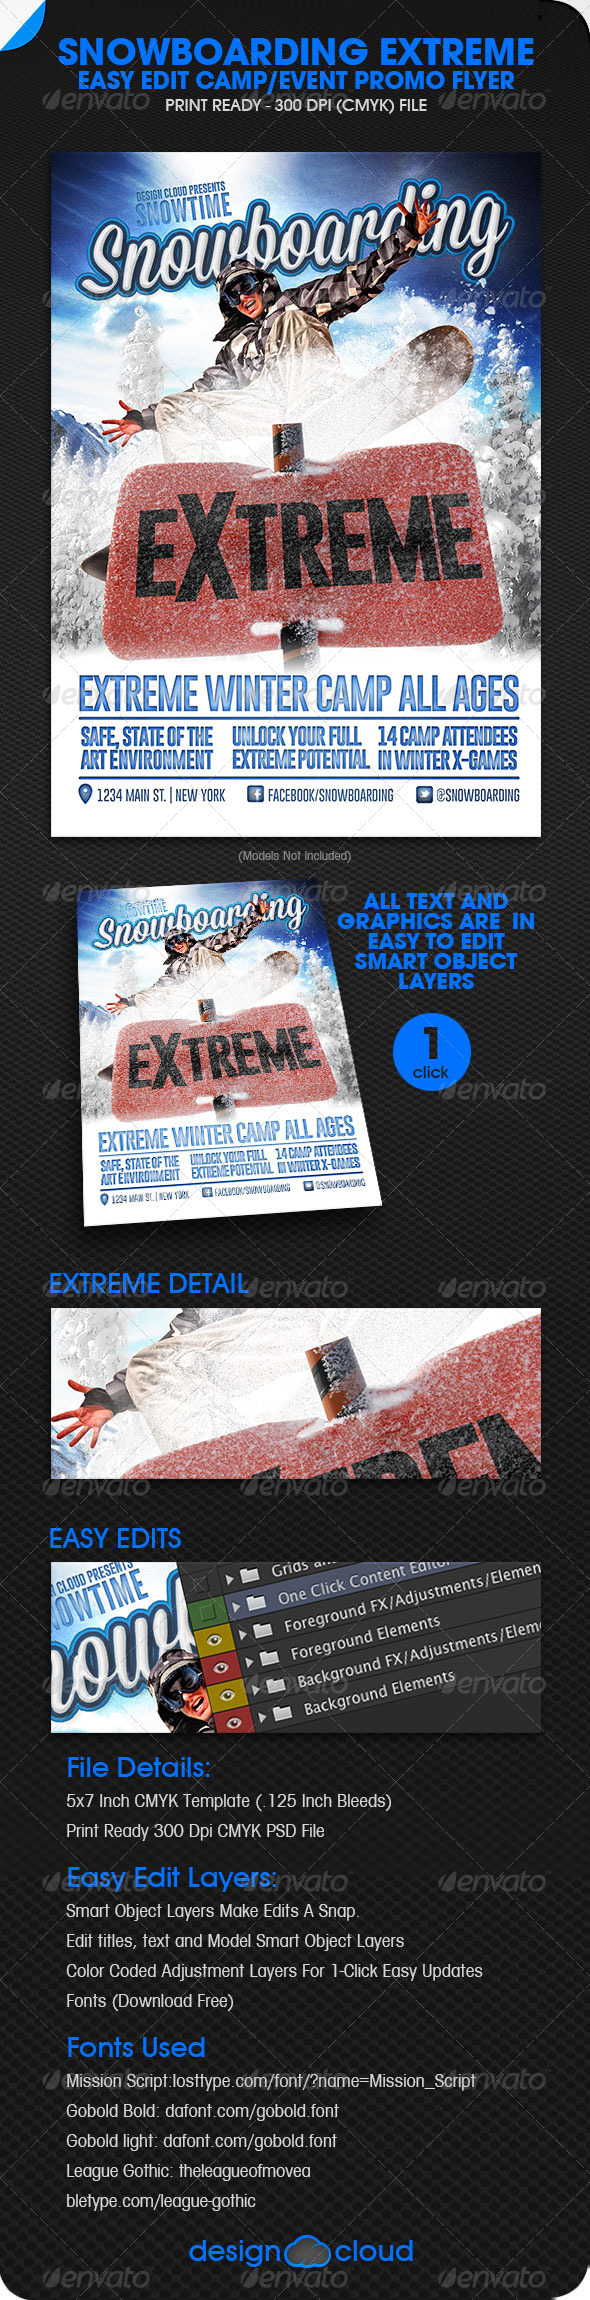 GraphicRiver Snowboarding Extreme Camp Event Promo 5903330